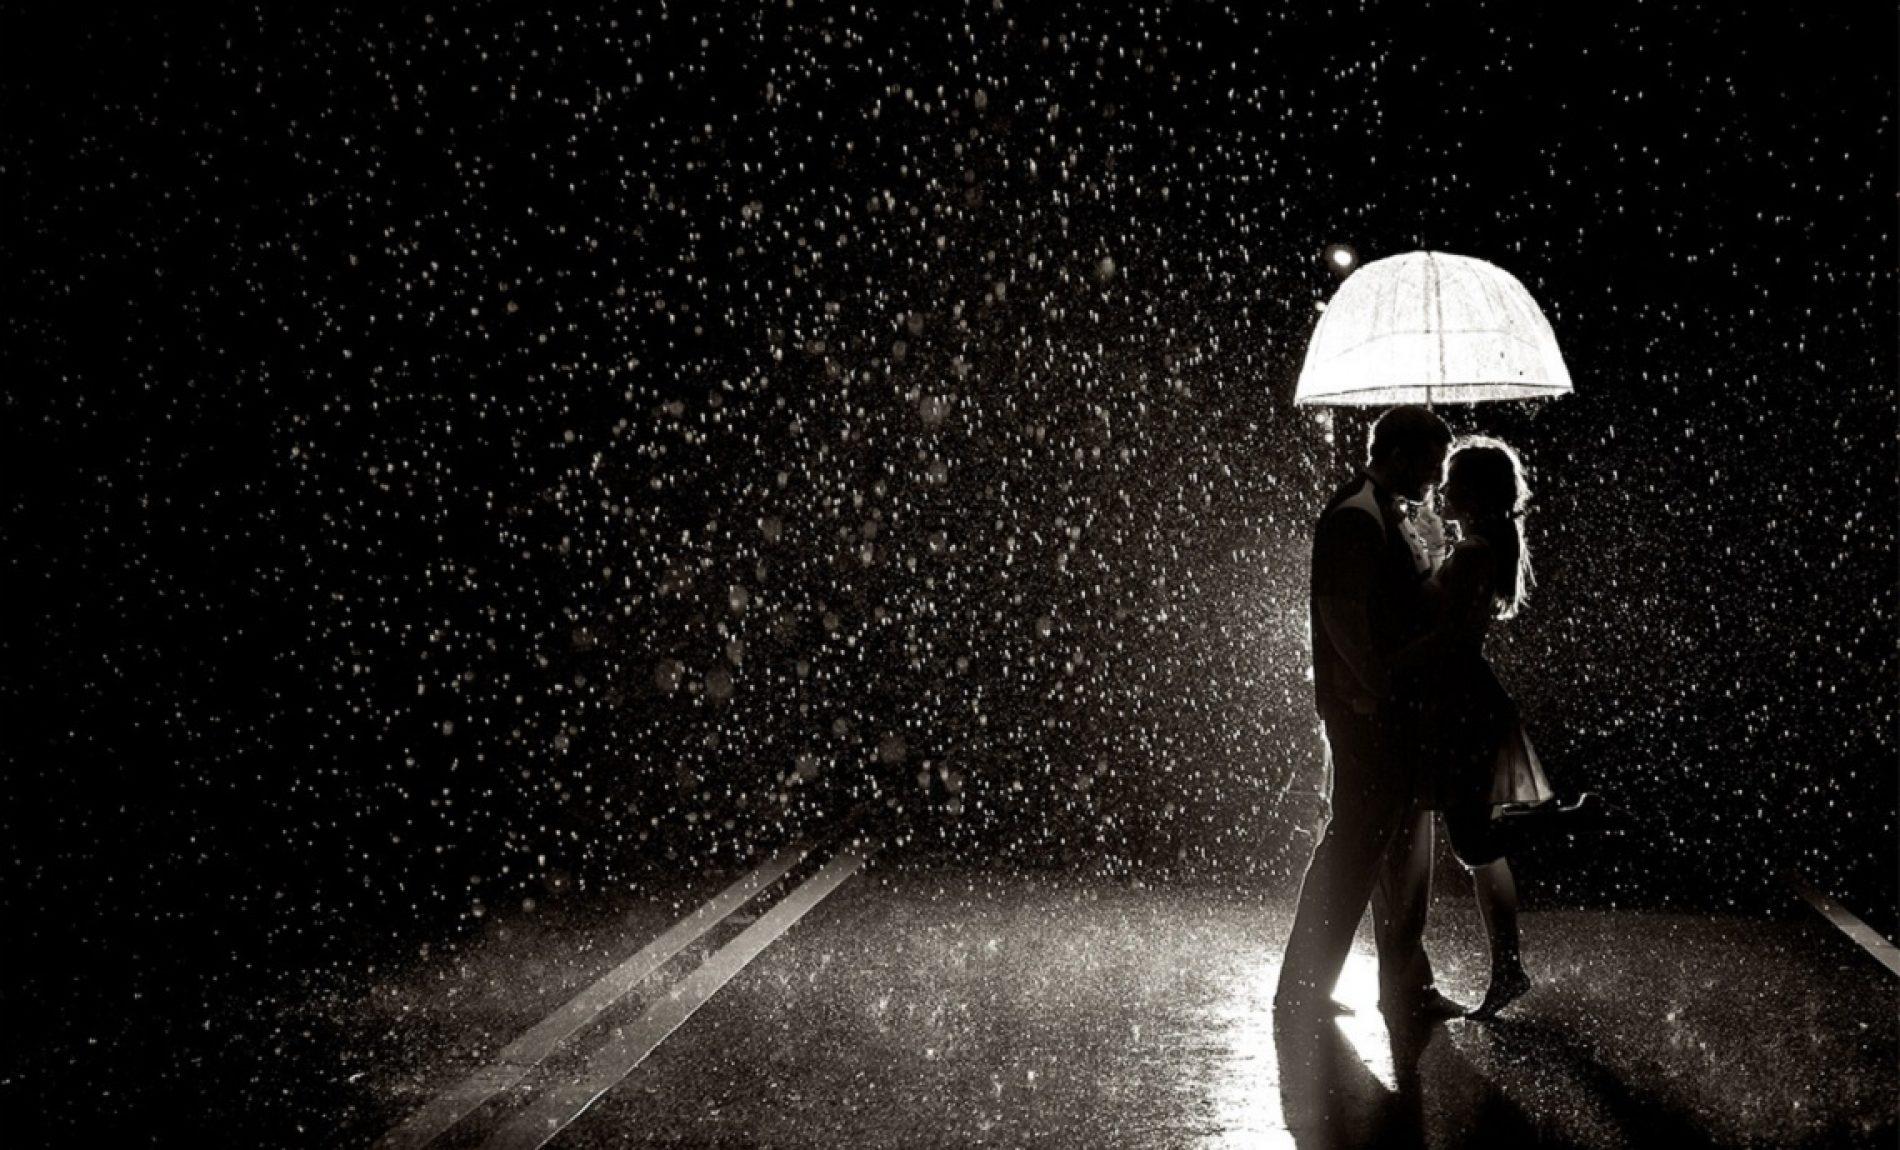 Matrimonio con la pioggia? Niente paura!